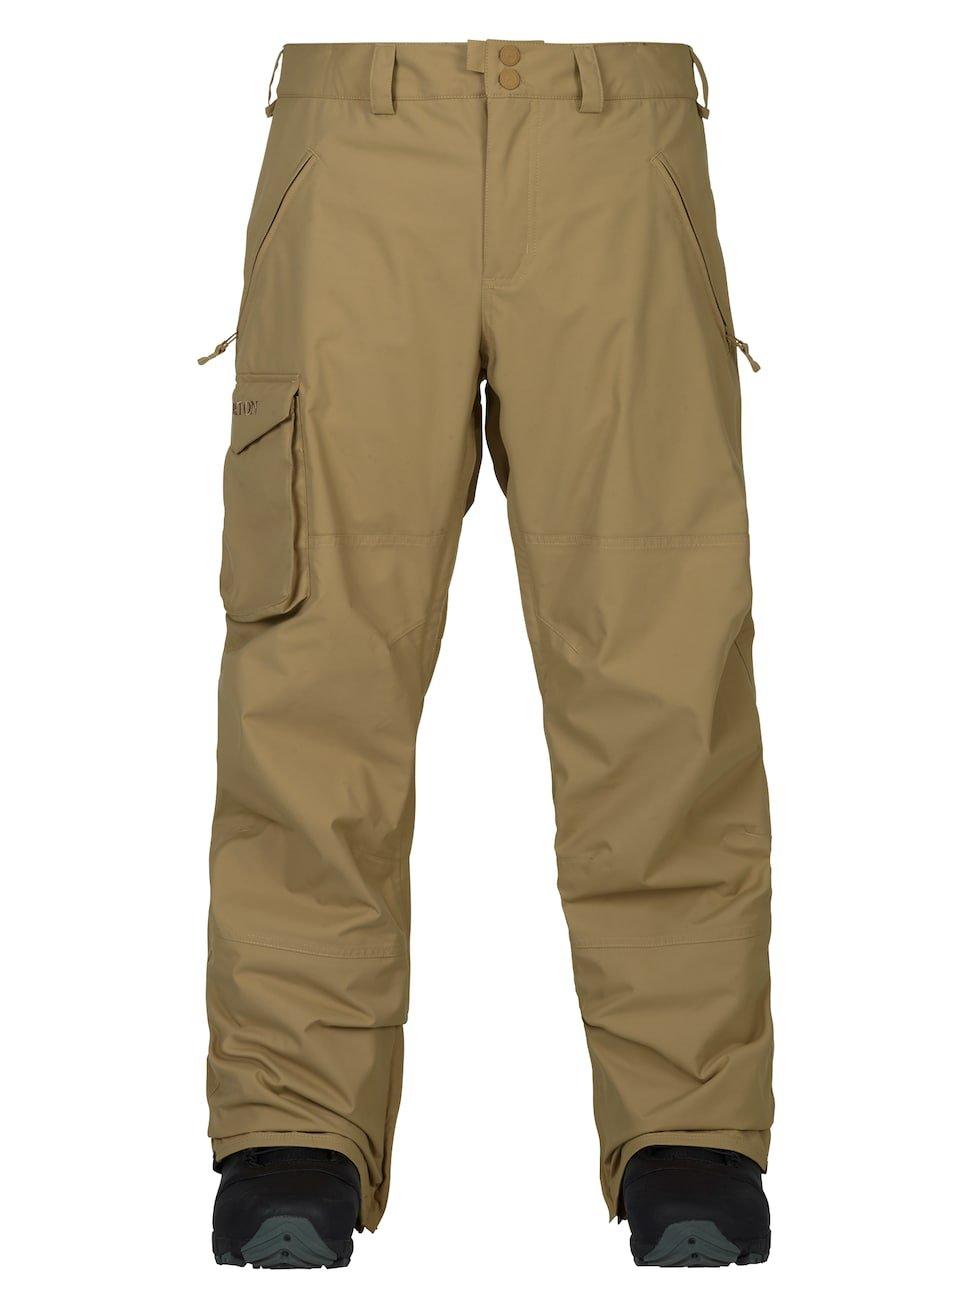 Burton Men's Insulated Covert Pants, Kelp, X-Large by Burton